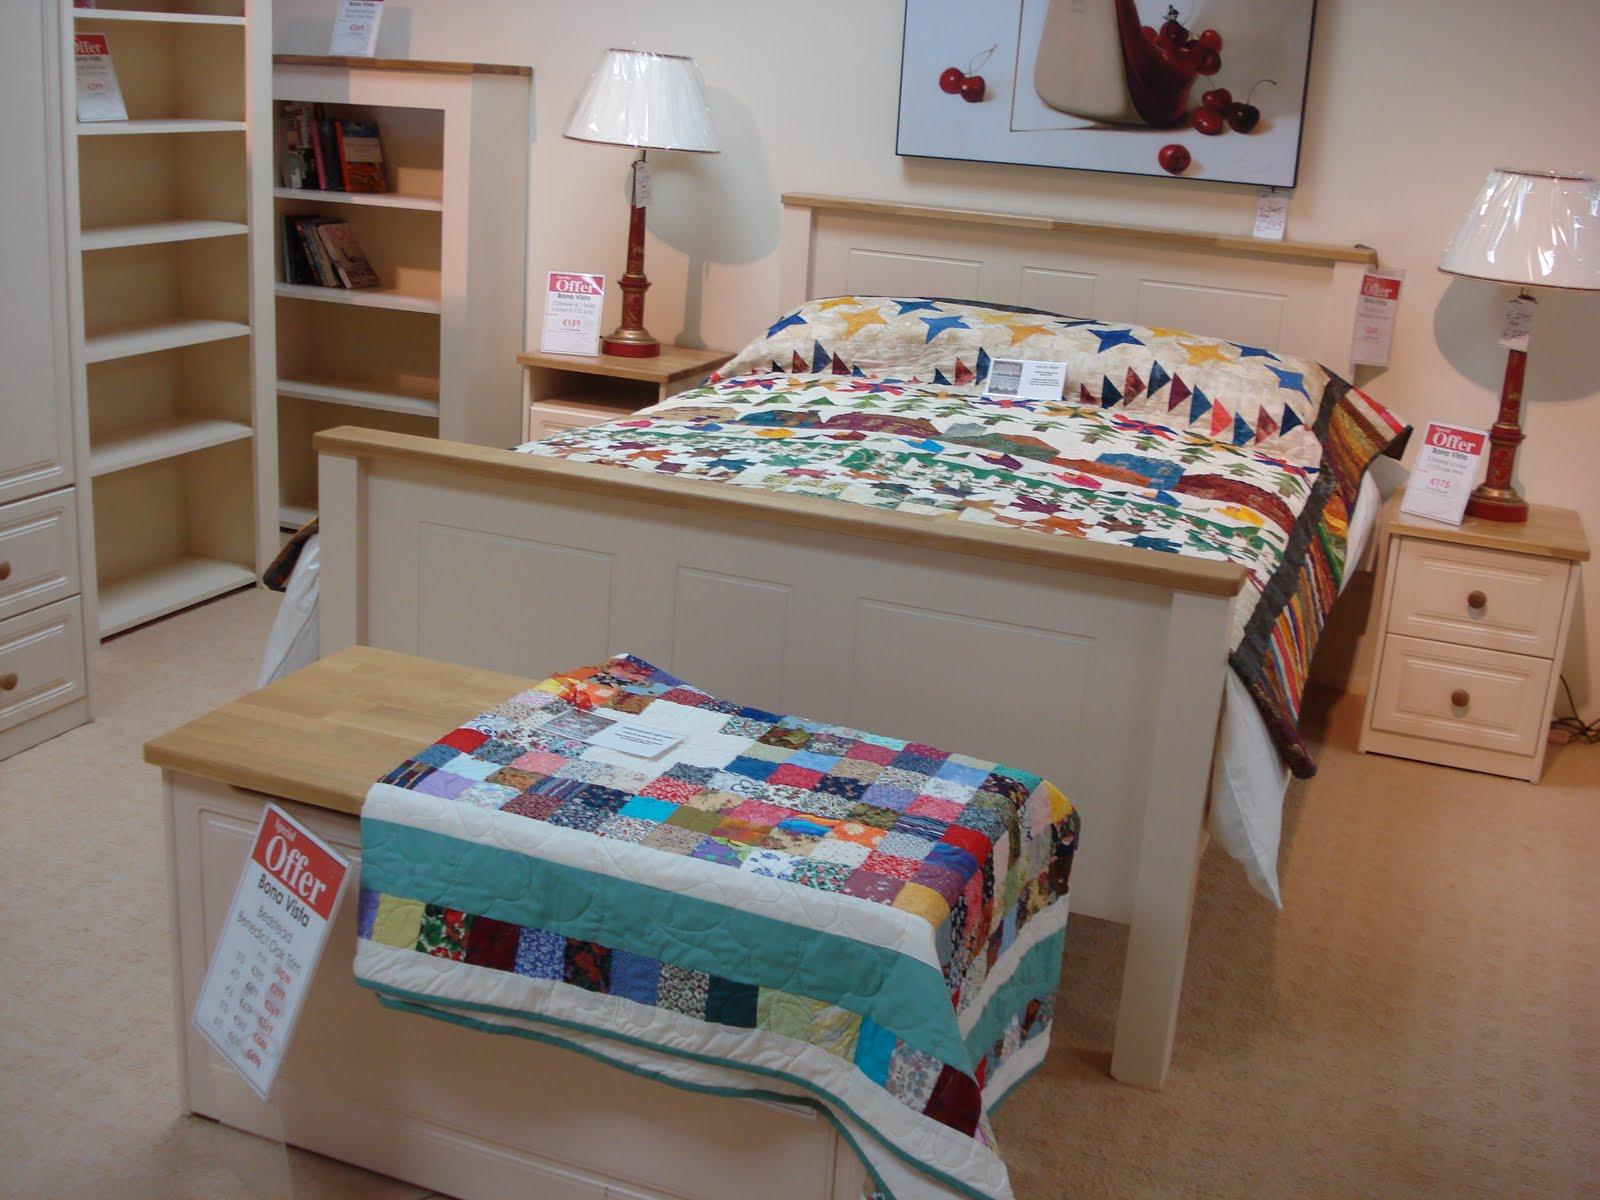 south midlands branch irish patchwork society. Black Bedroom Furniture Sets. Home Design Ideas